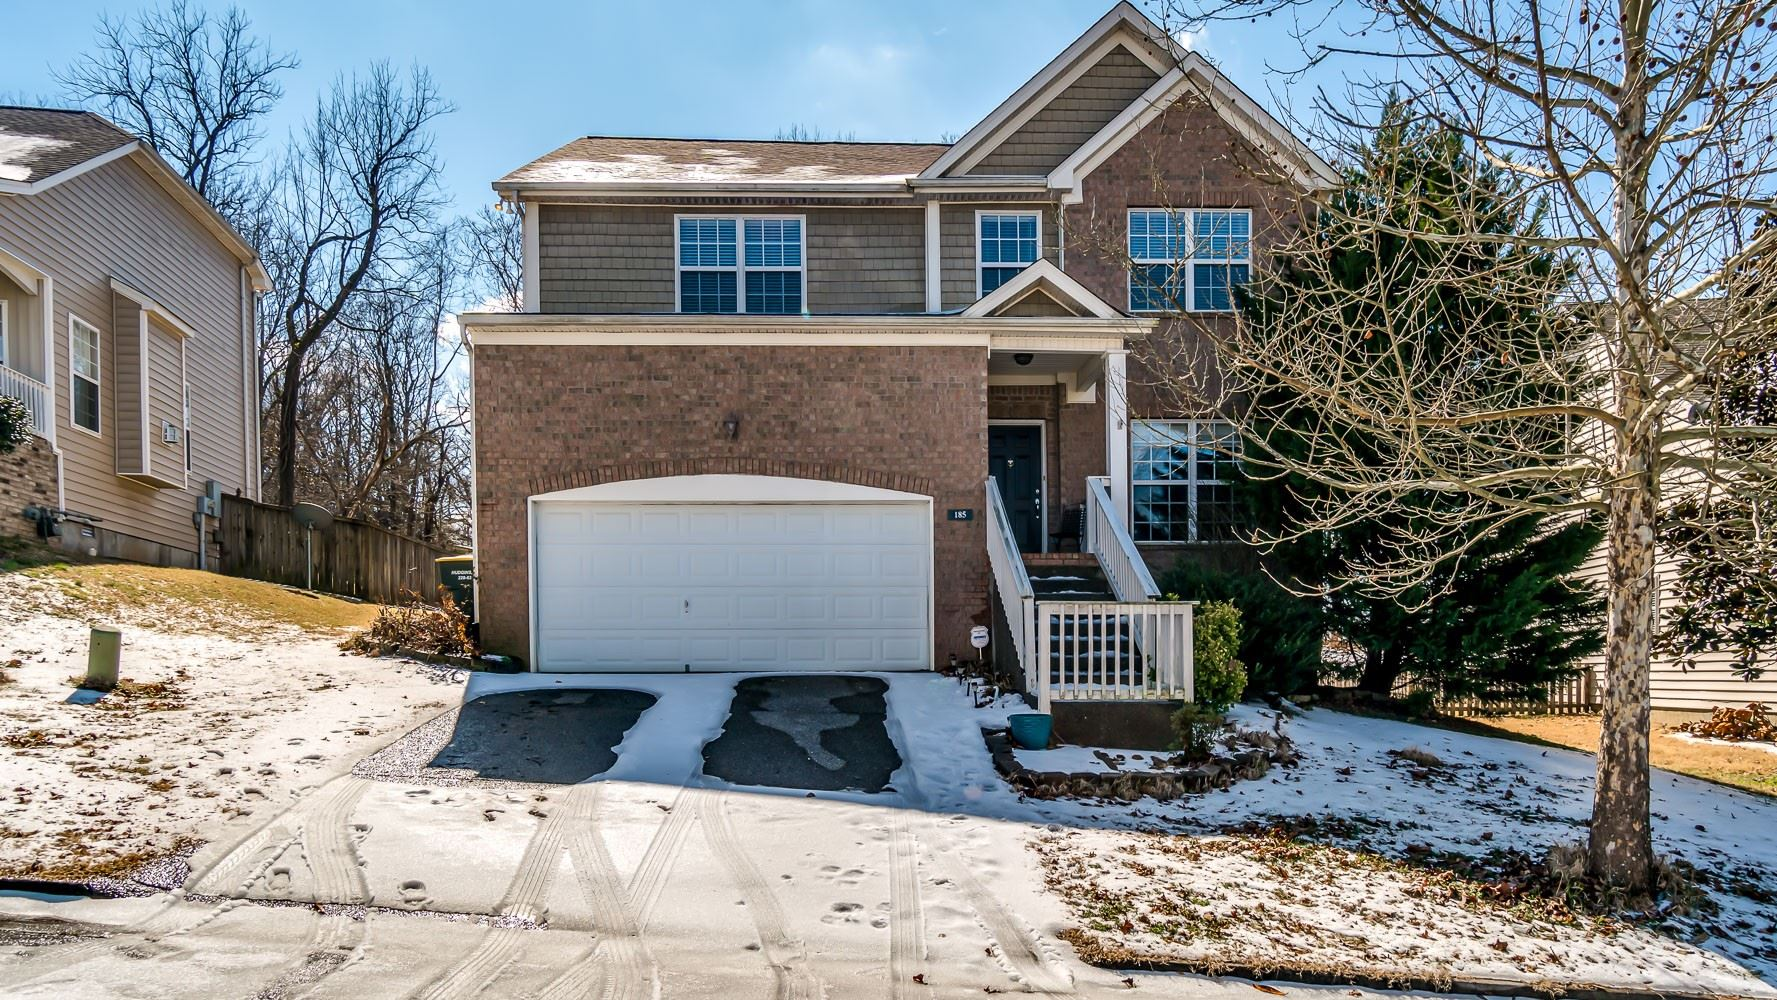 185 Claybrook Lane, Antioch, TN 37013 - MLS#: 2229452